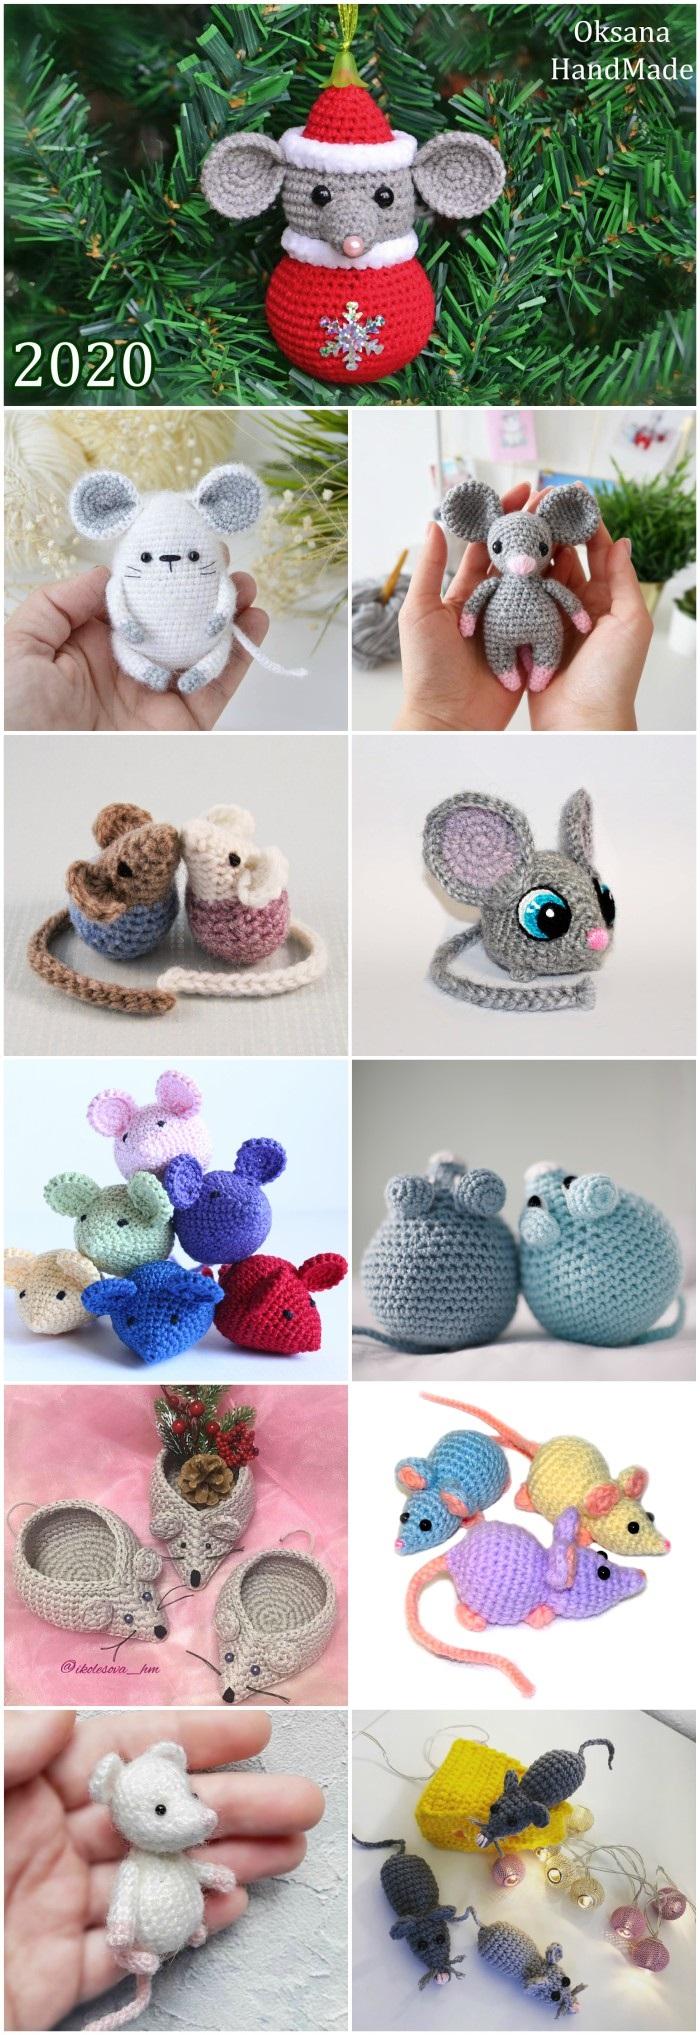 Amigurumi Cute Mouse Free Crochet Pattern - Crochet.msa.plus | 2035x700